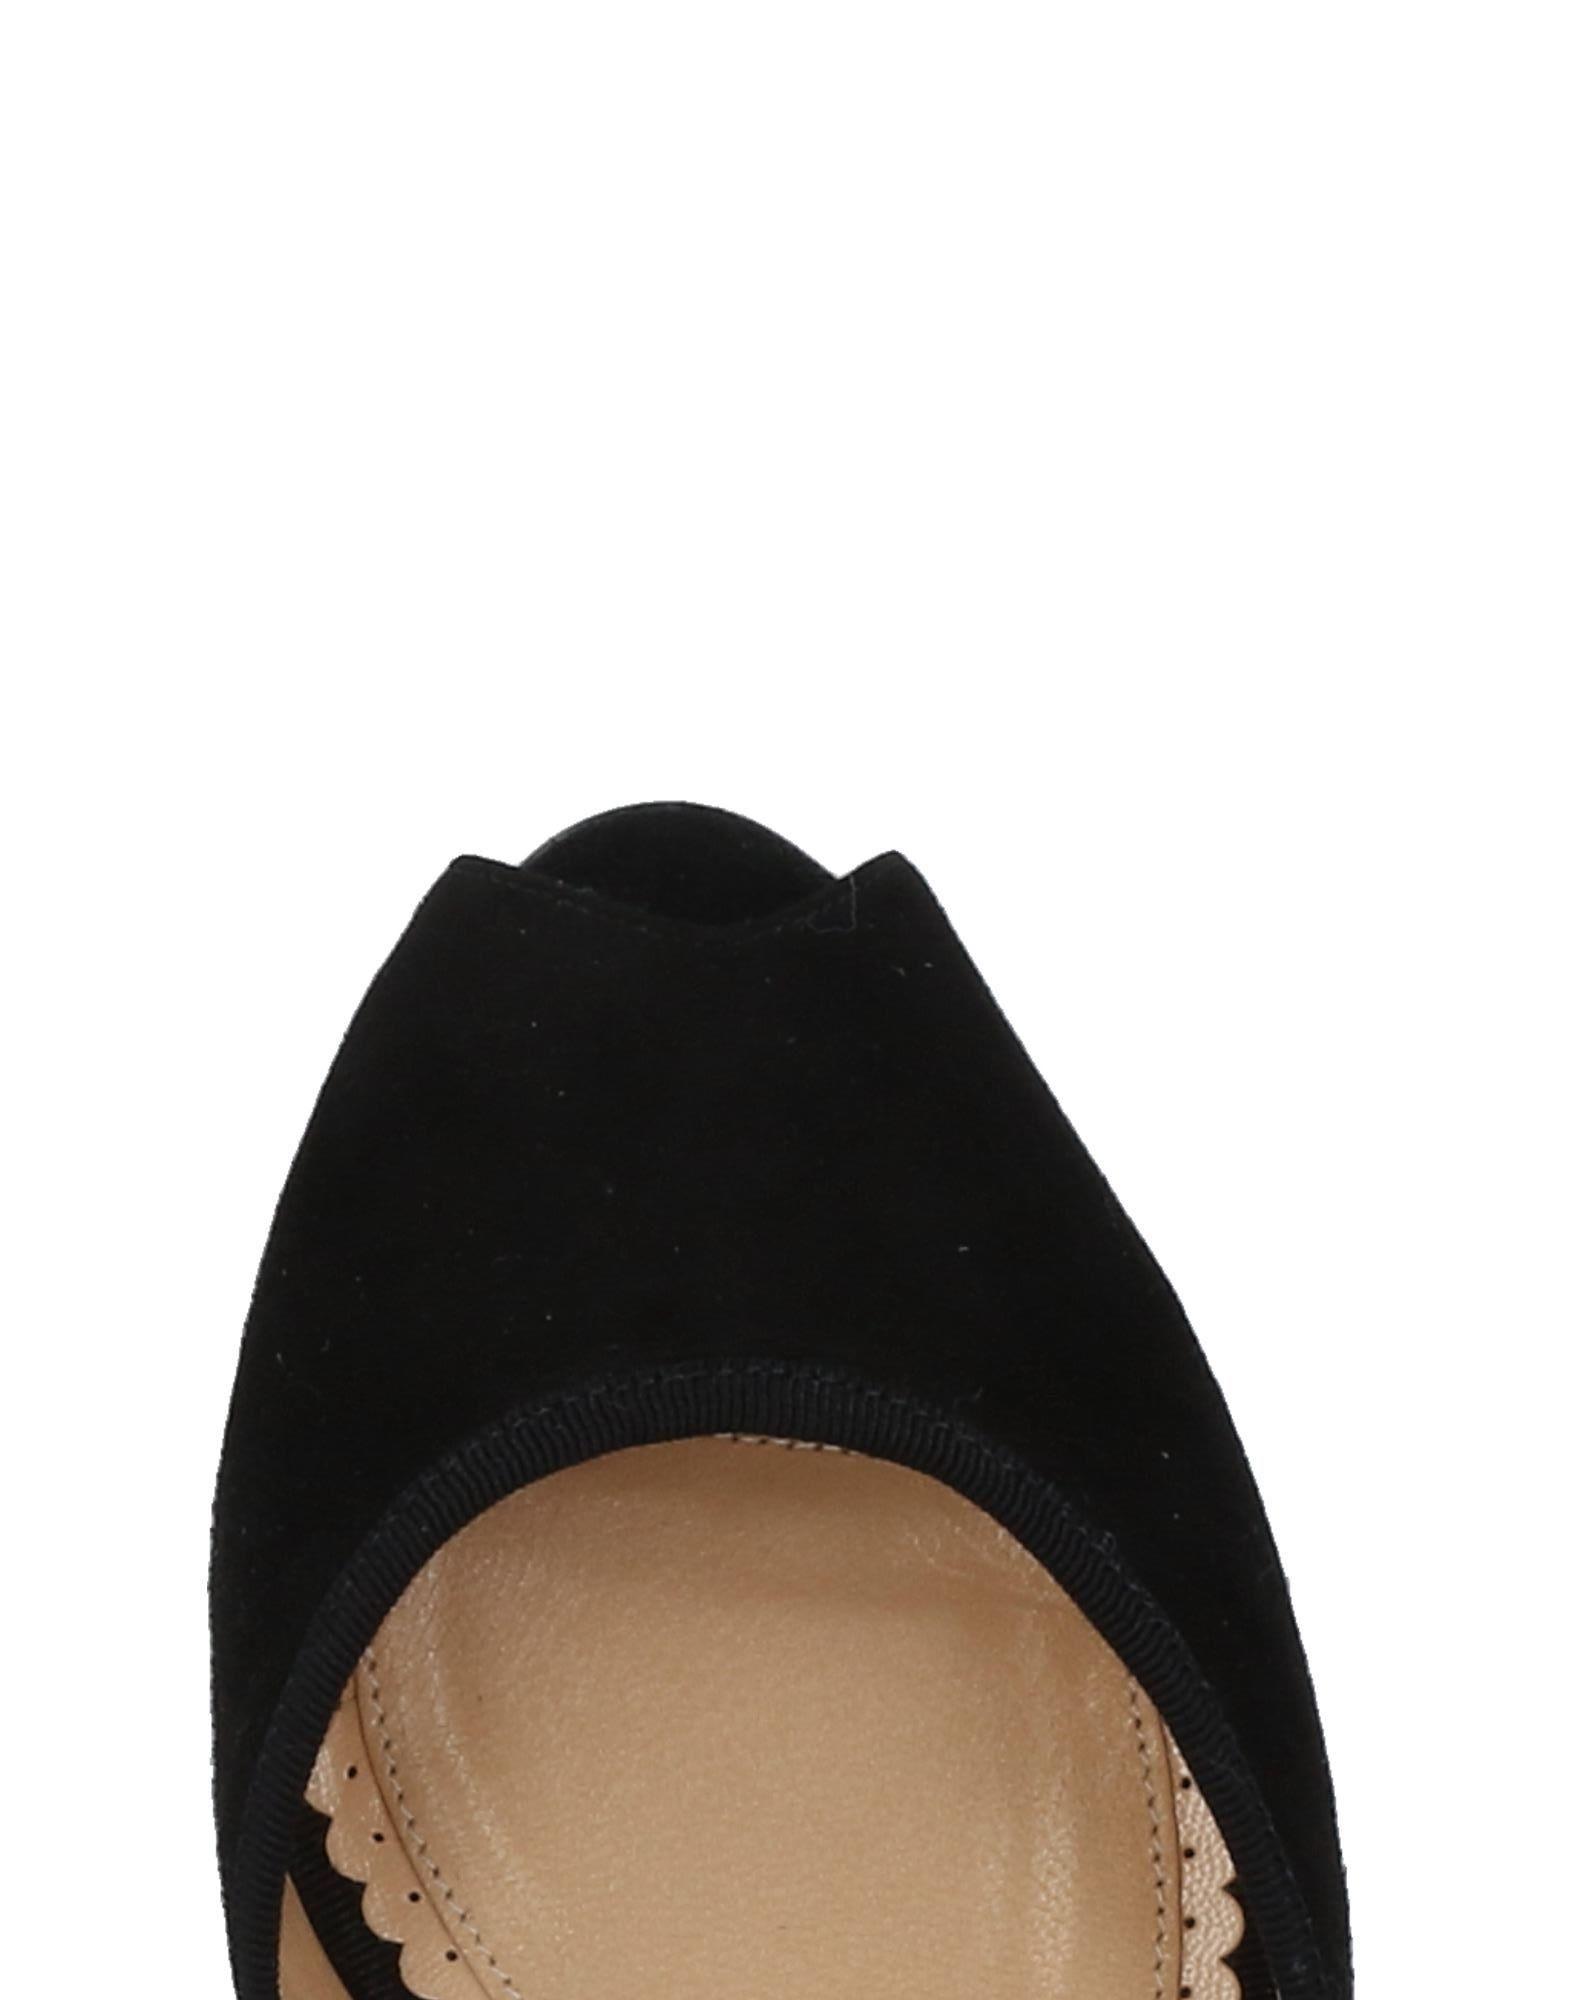 Charlotte Olympia  Sandalen Damen  Olympia 11491512EC Beliebte Schuhe 823b80